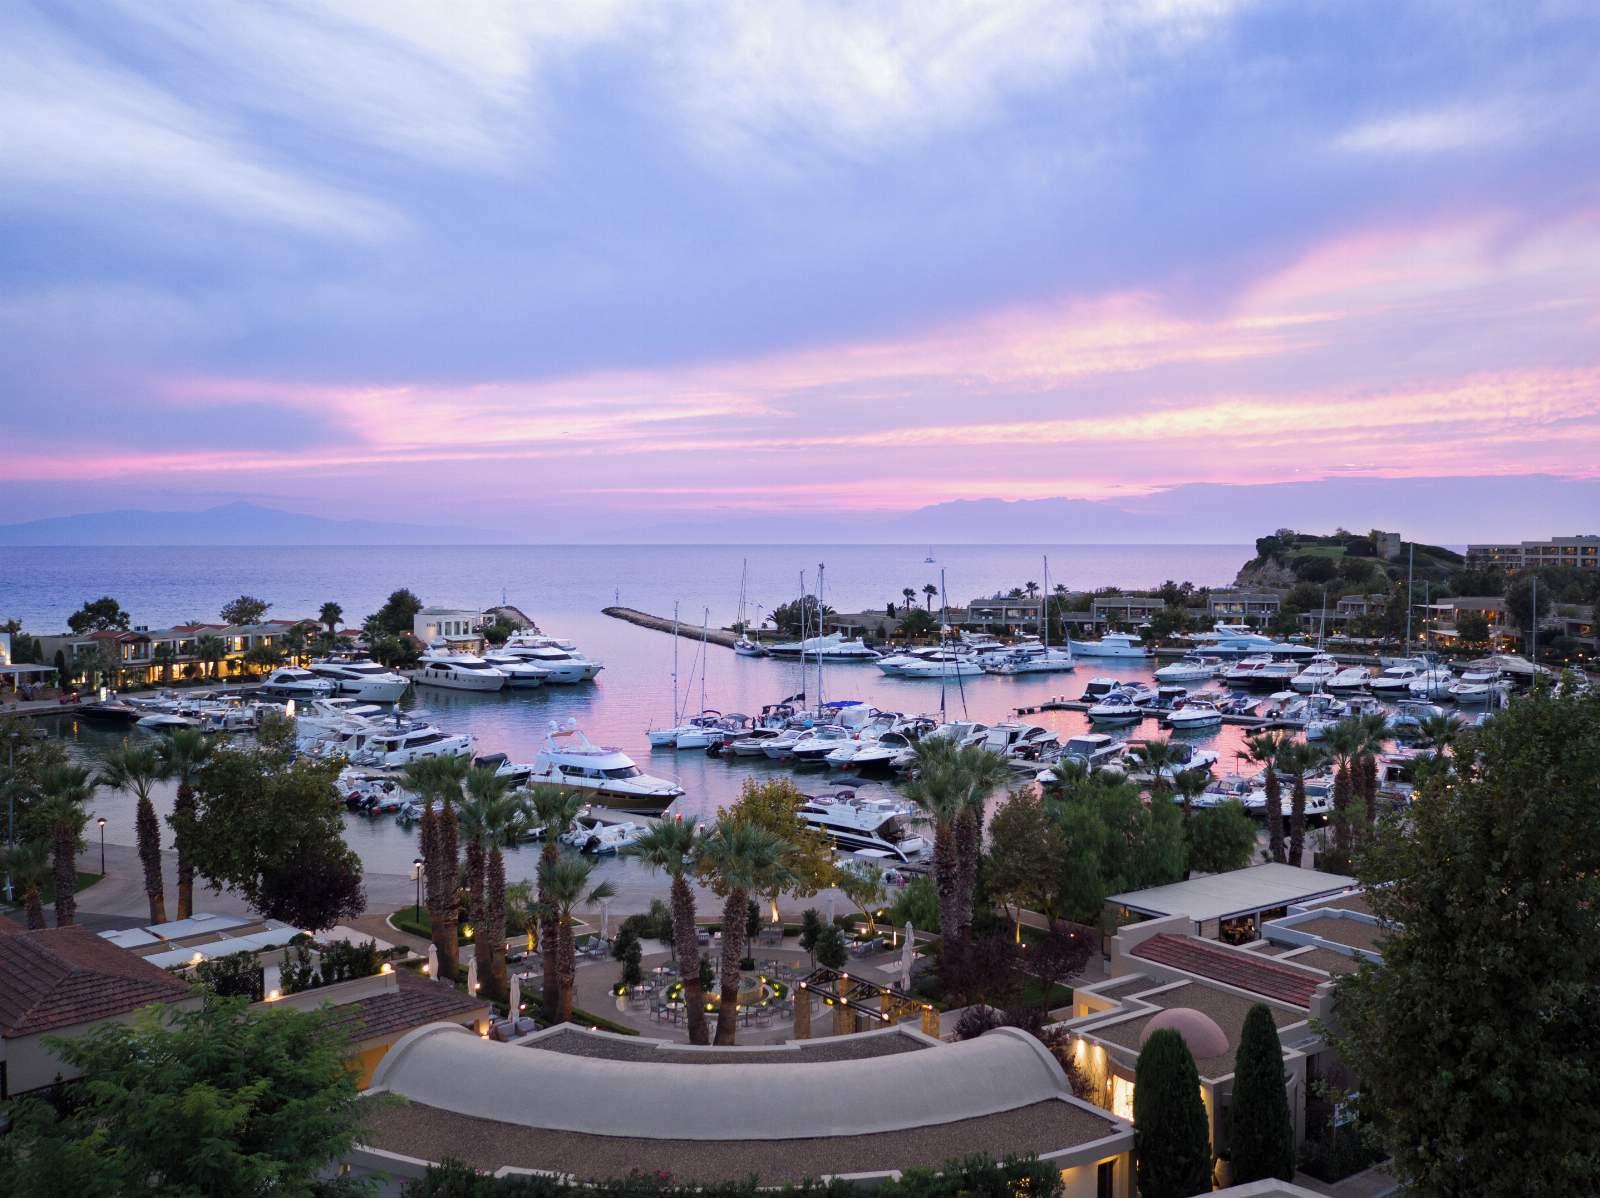 Sani Resort - Marina